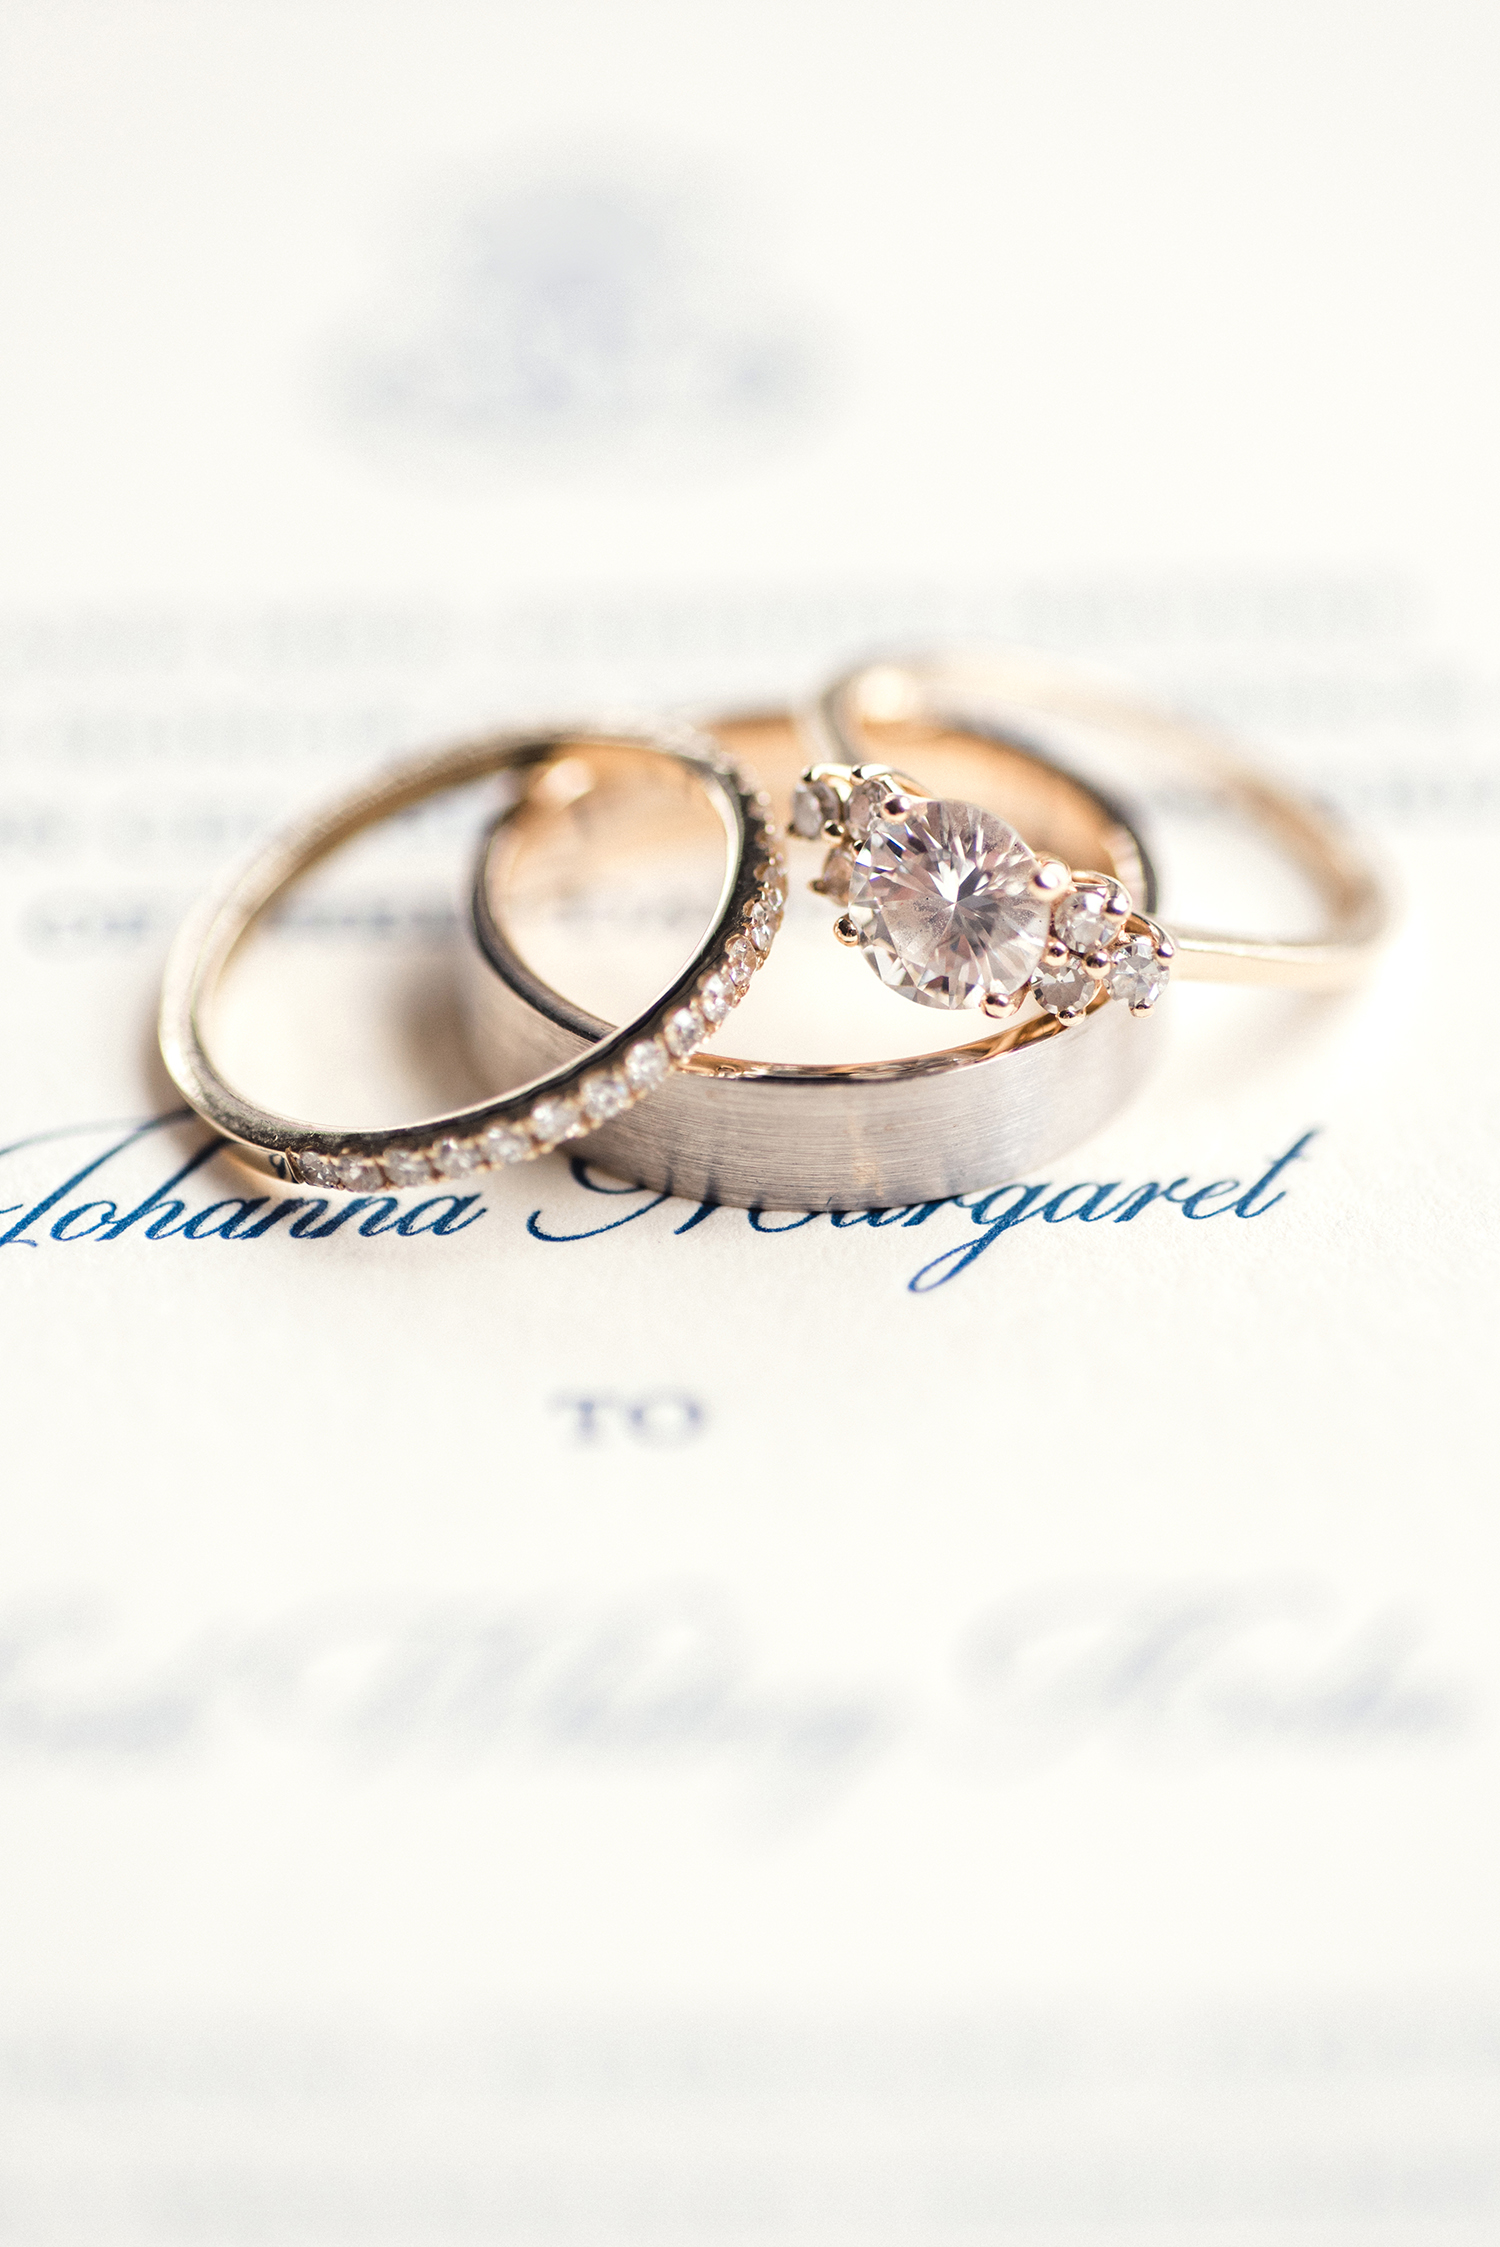 johanna erik wedding rings